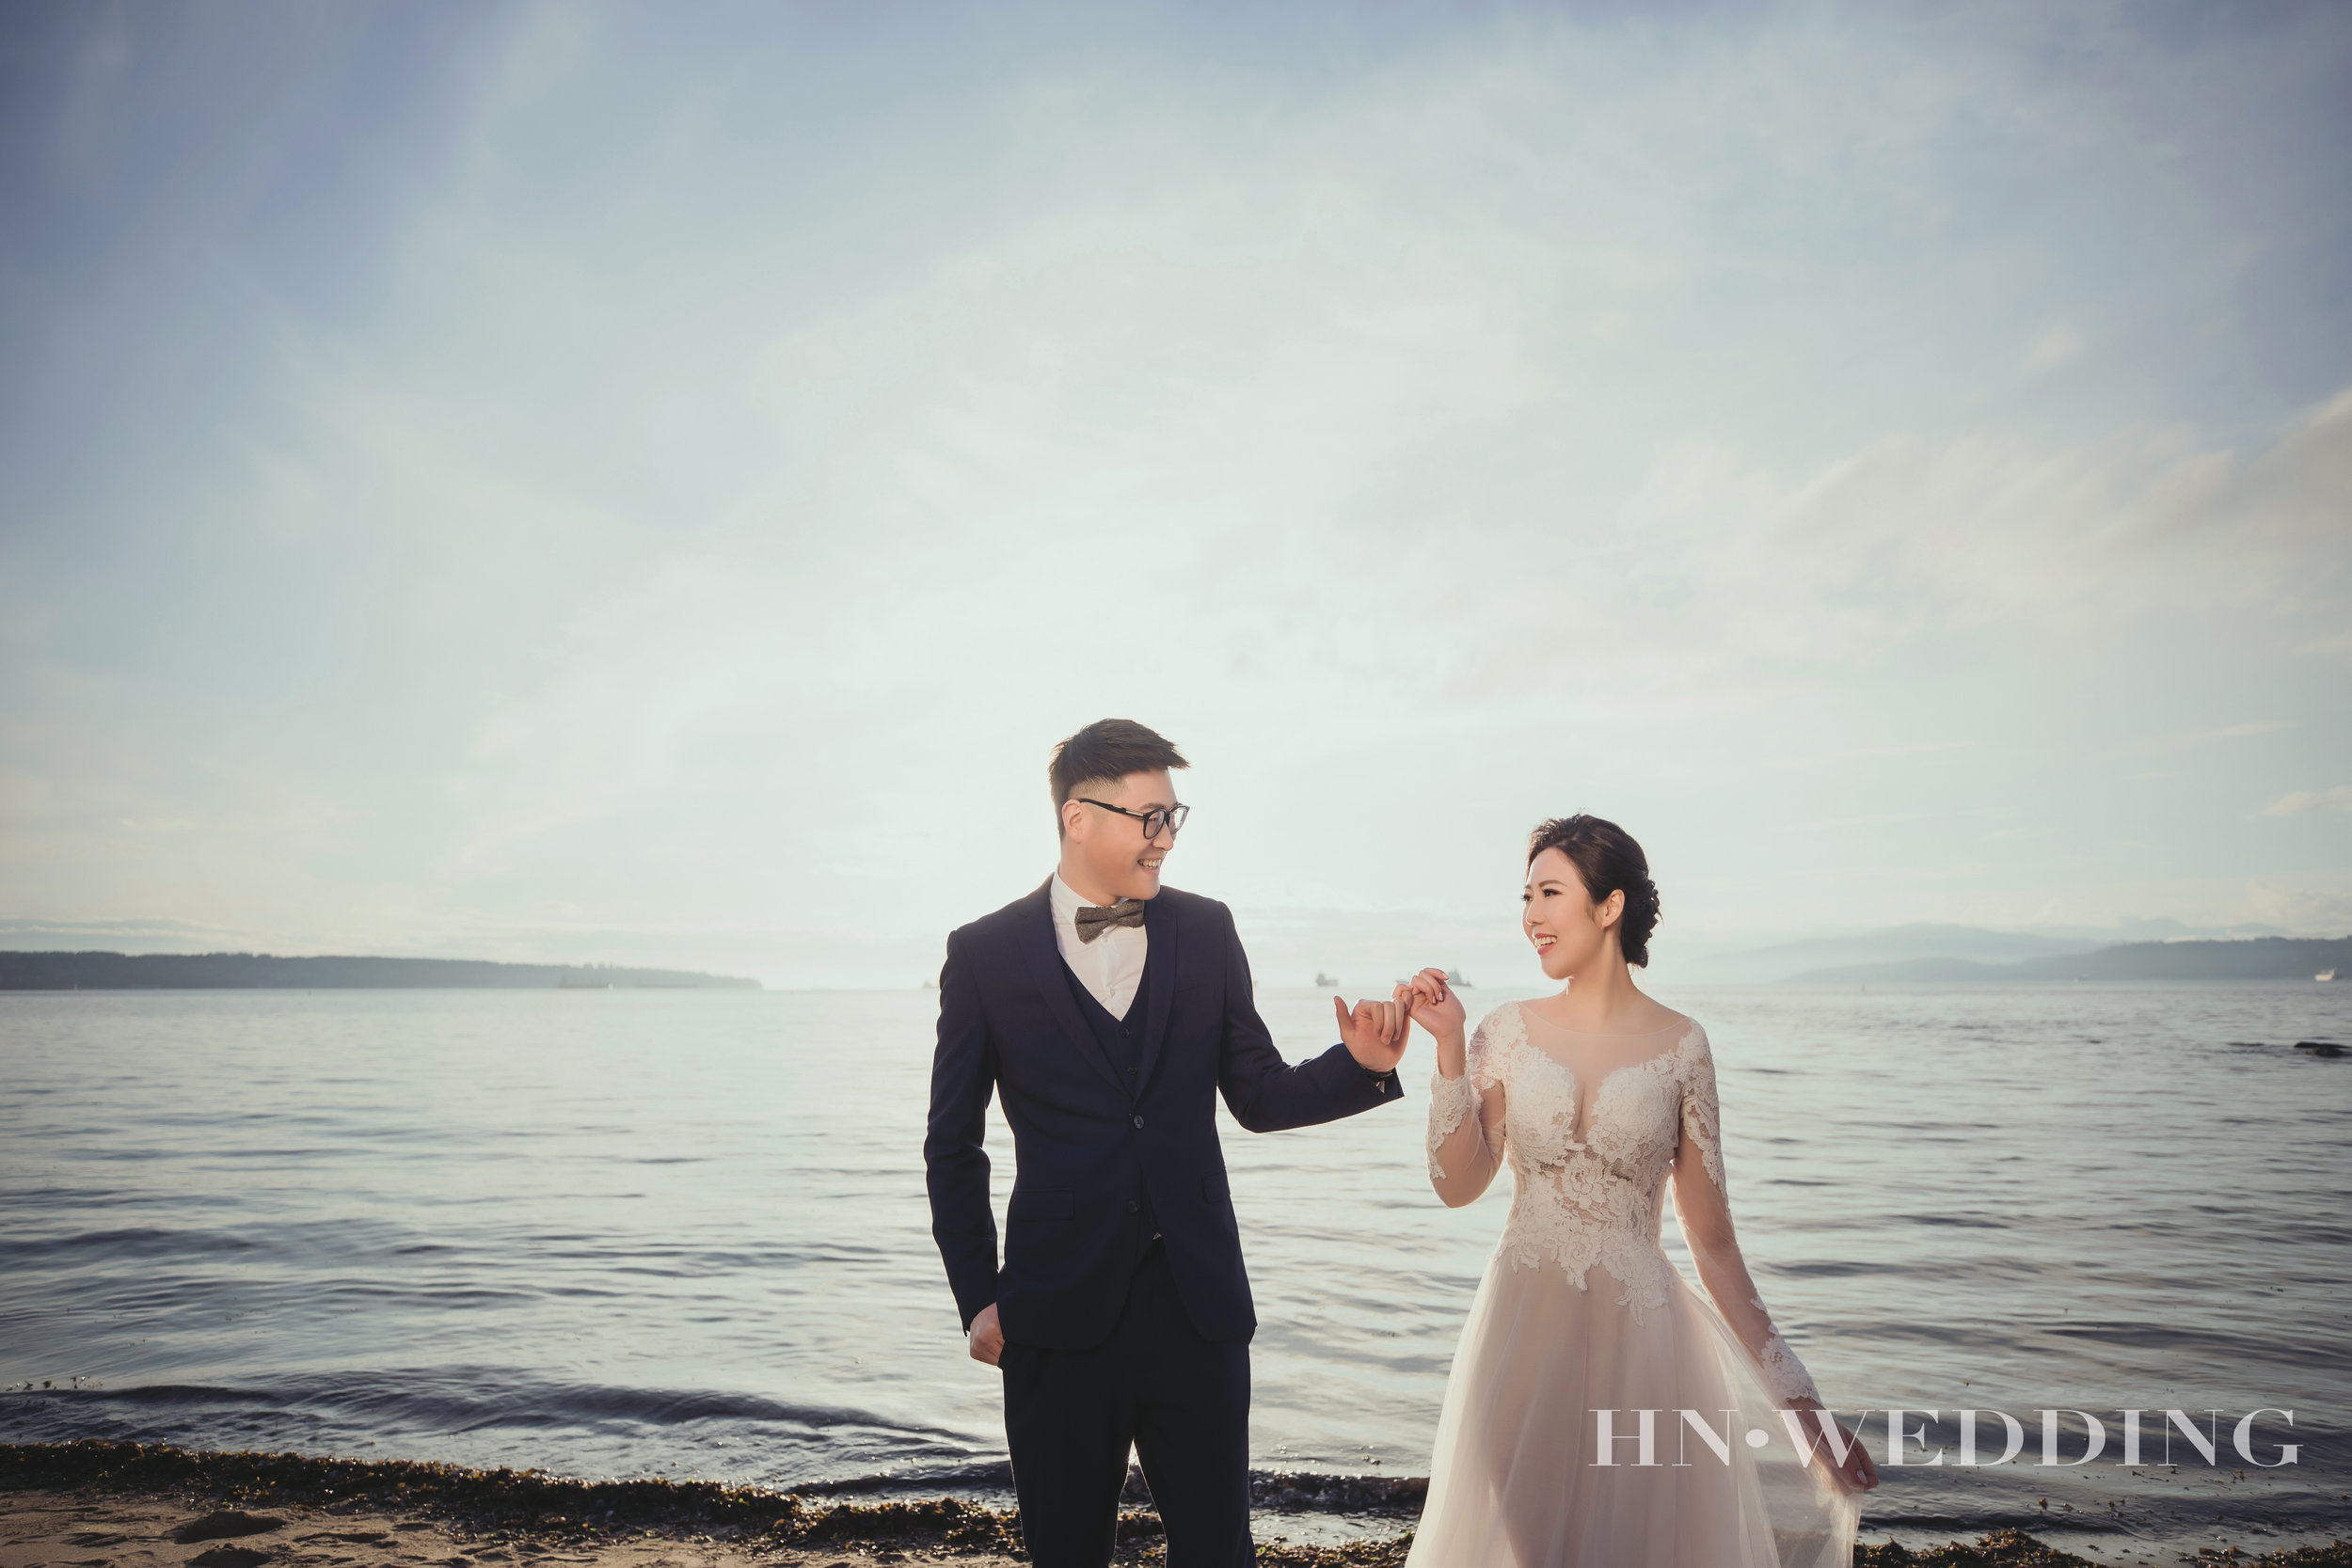 hnwedding20180519wedding-9.jpg